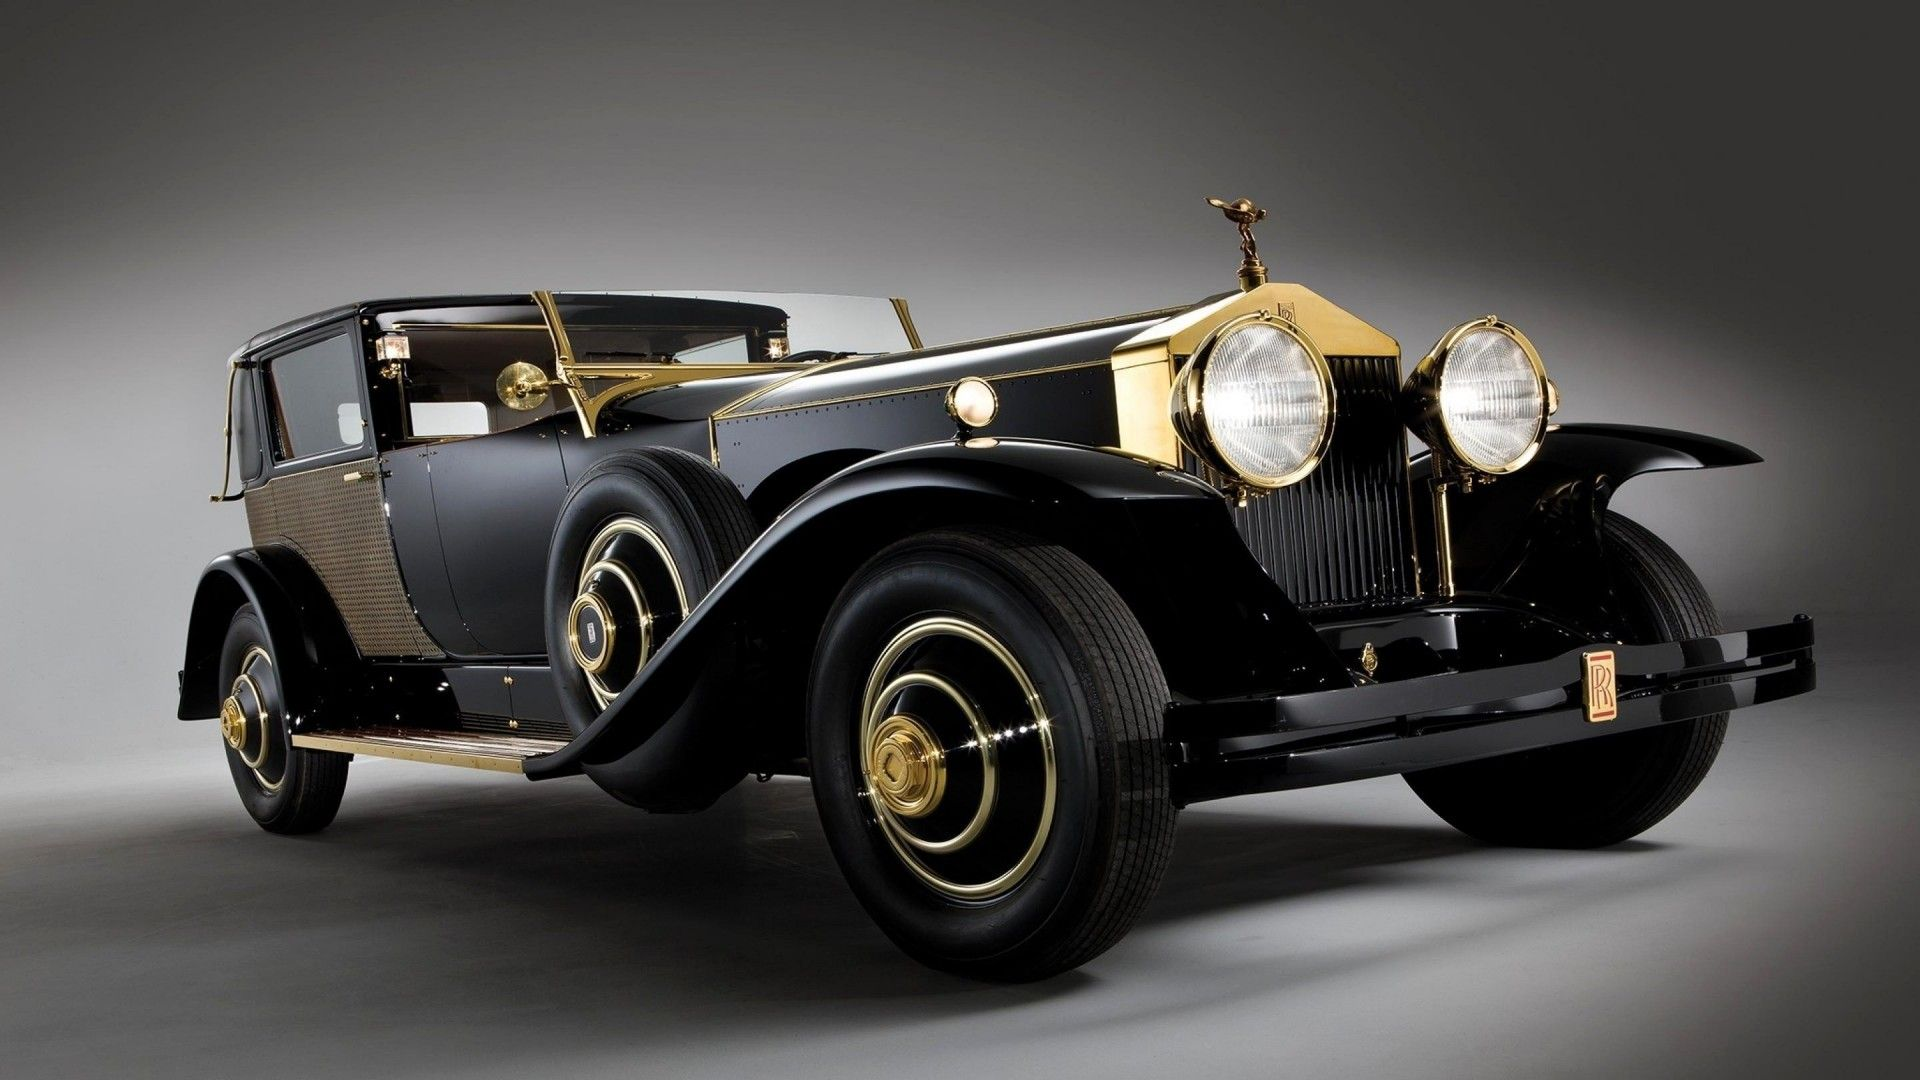 Rolls royce phantom i world of classic cars rank 167